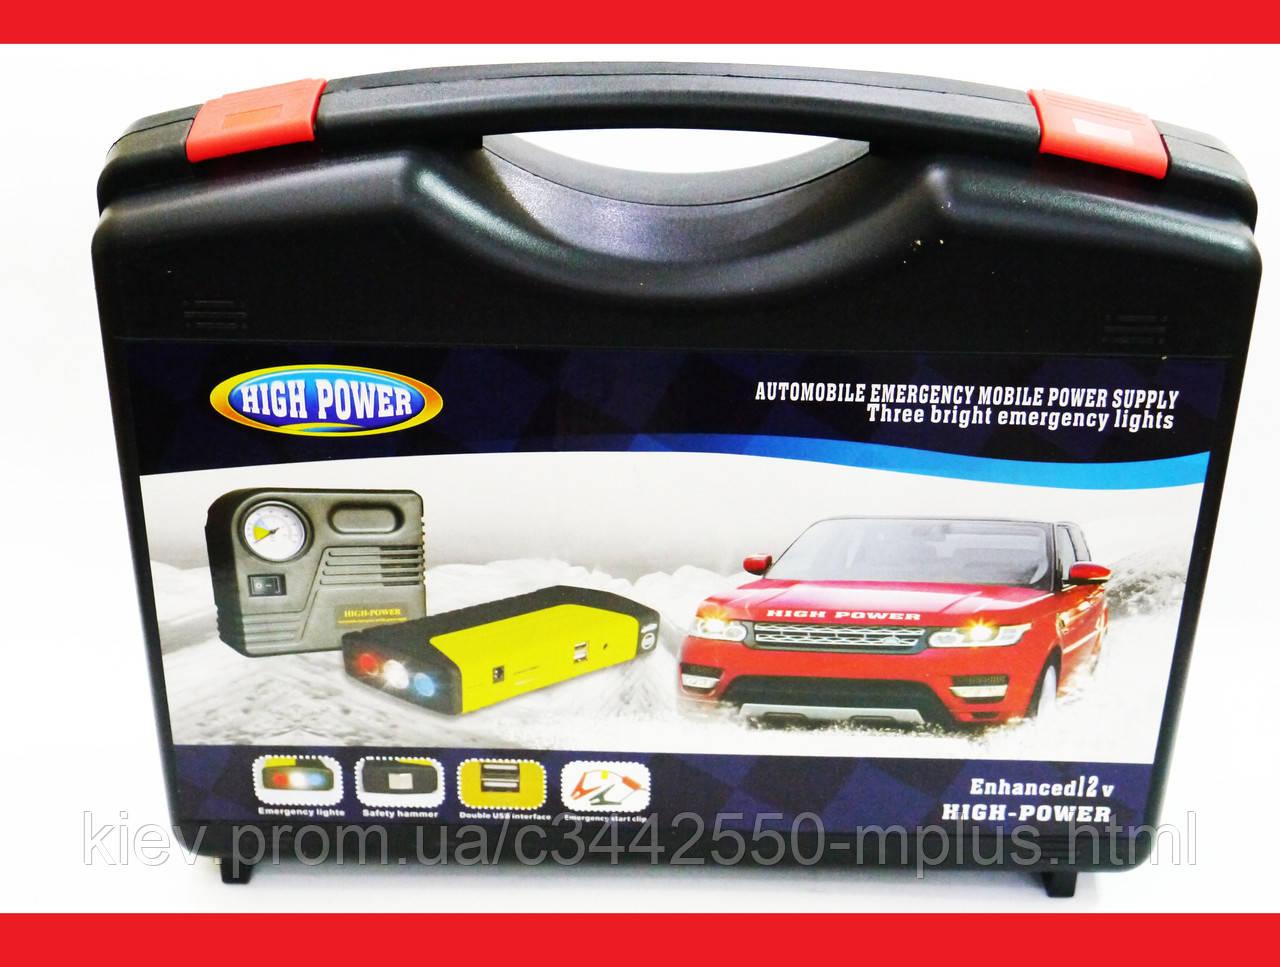 Car jump starter 20000mAh Повер банк зарядно пусковое устройство для машины 2хUSB+Фонарик + Компрессор